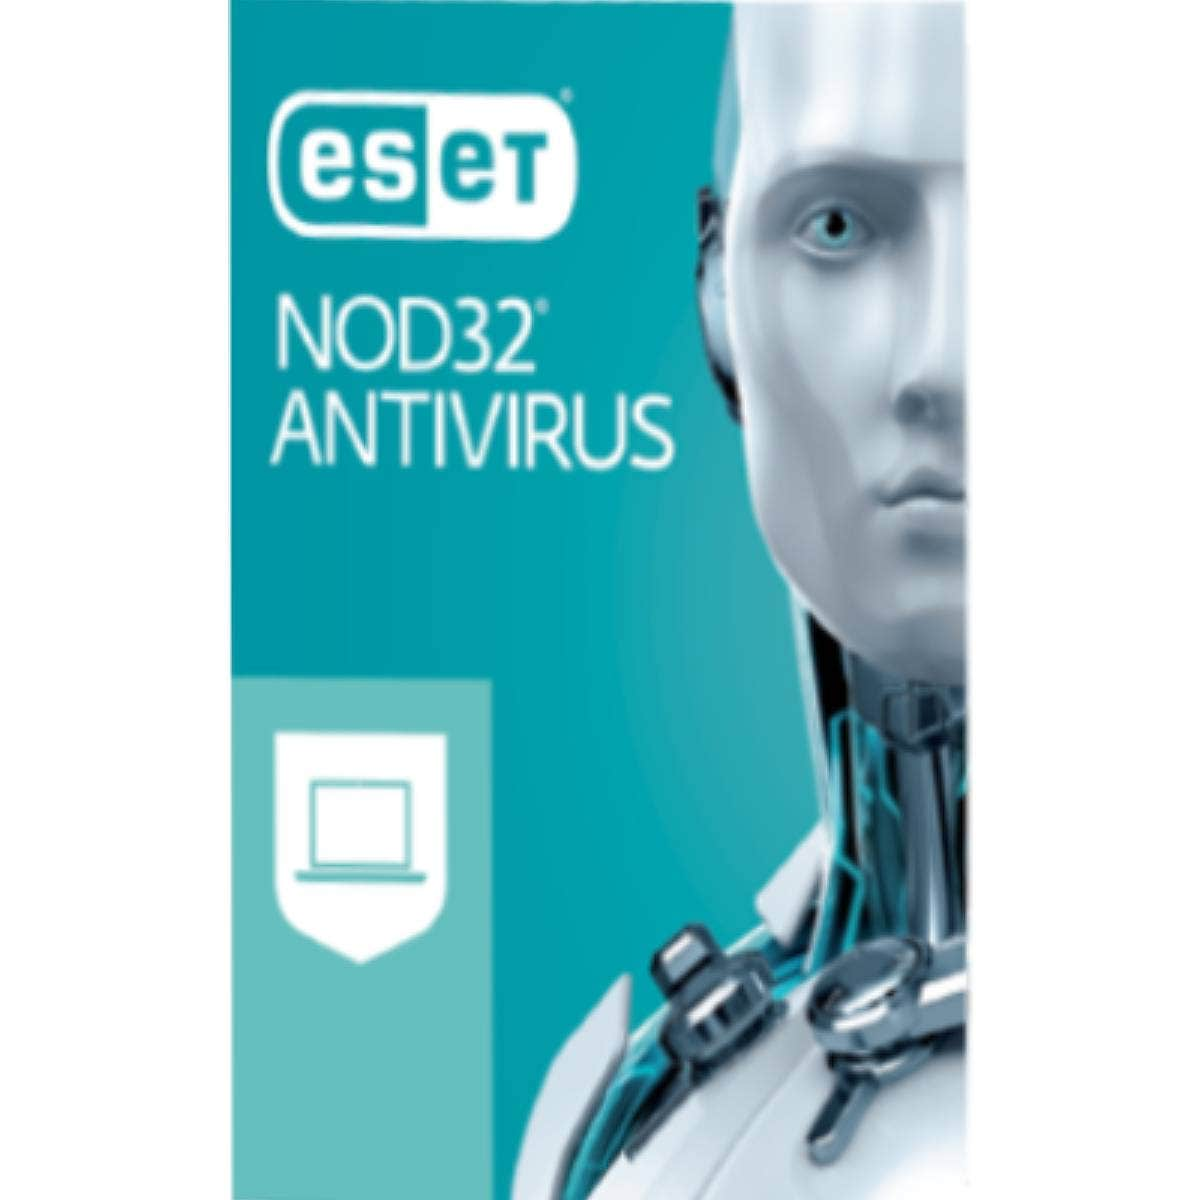 Antivirus Eset NOD32 3 Meses Gratis Regalía